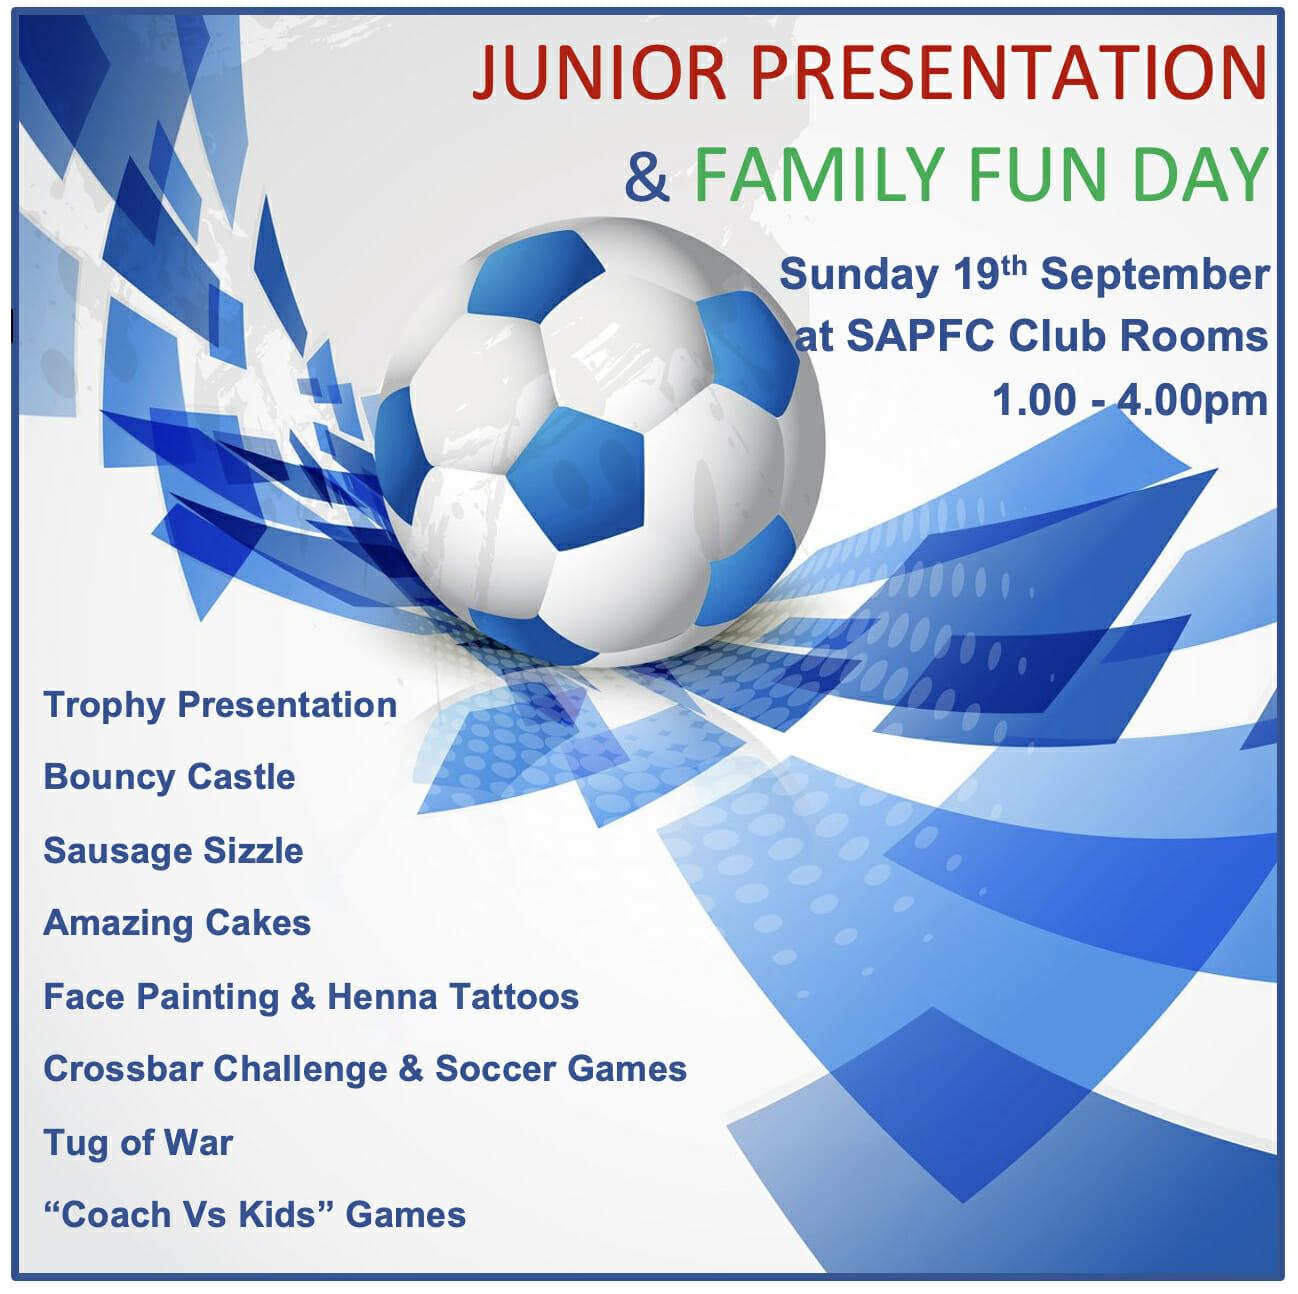 Junior Presentation & Family Fun Day